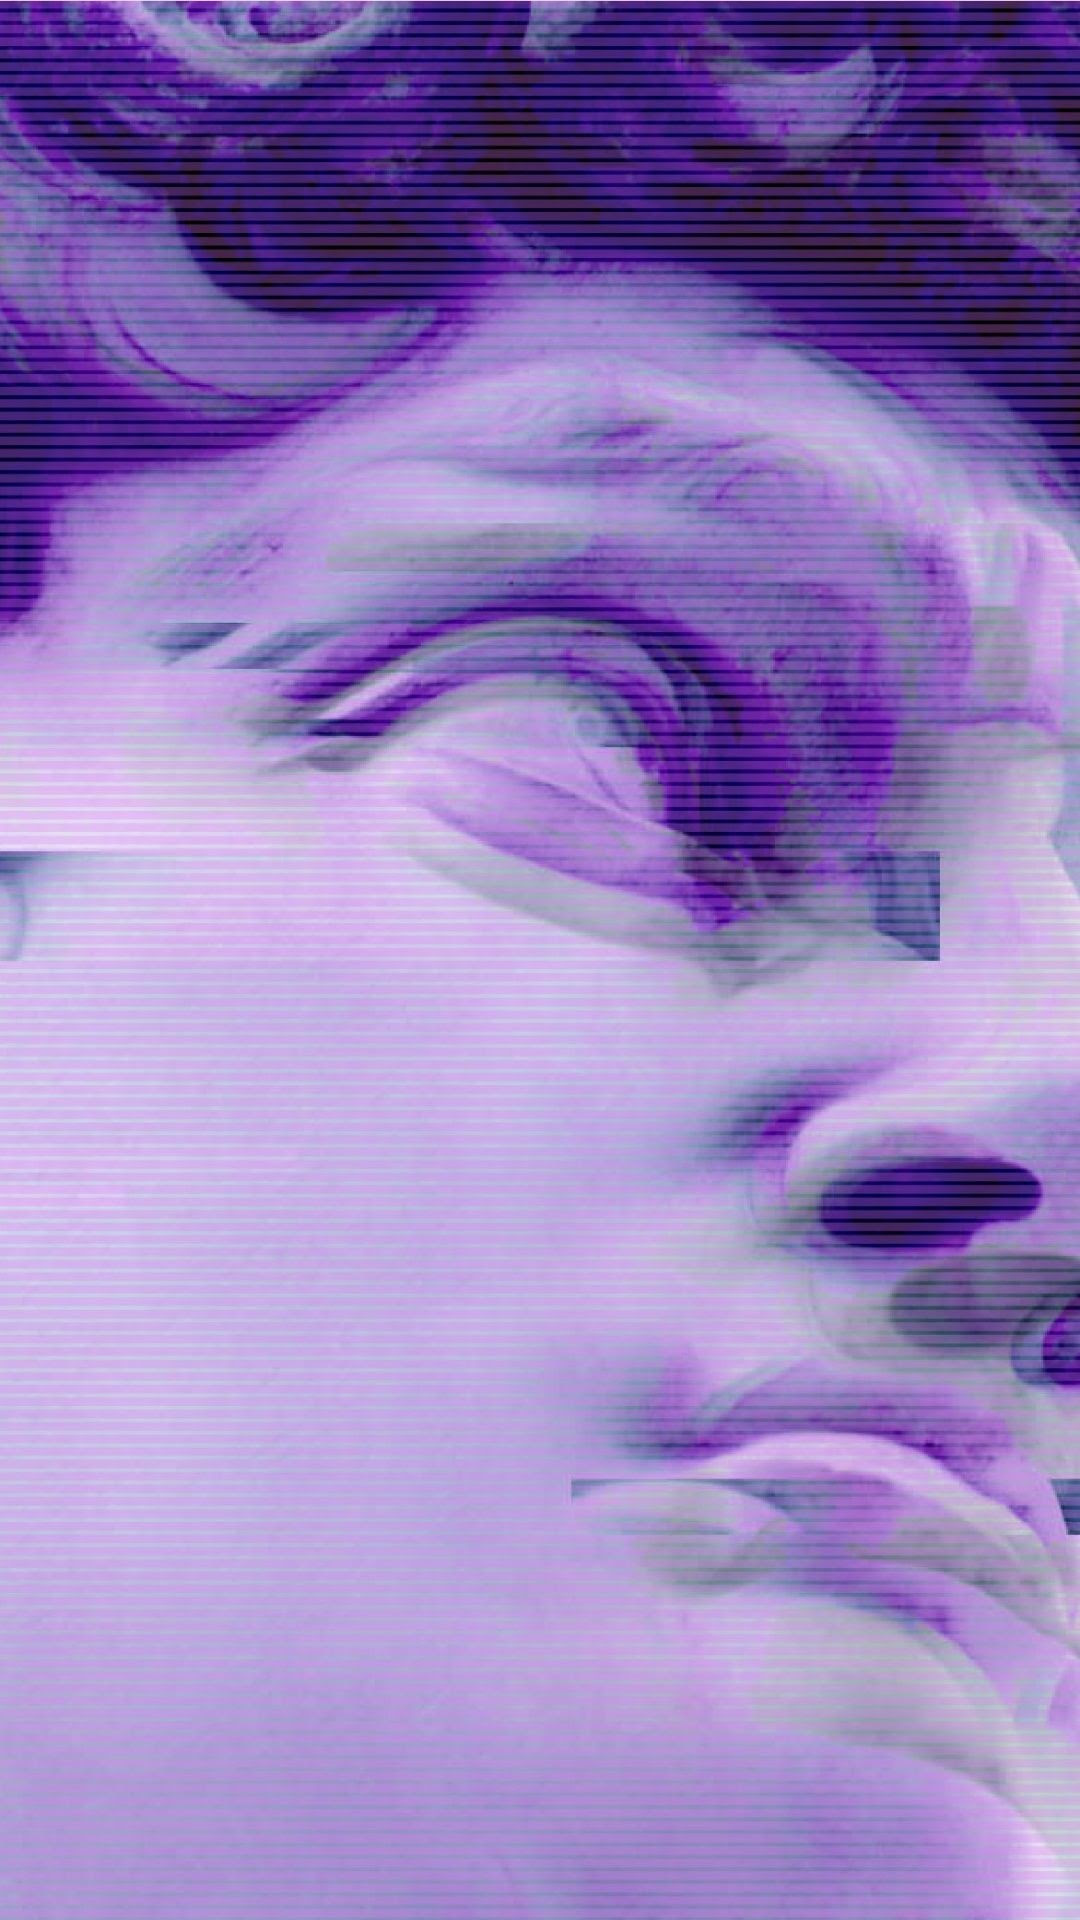 Vaporwave Wallpapers (79+ images)